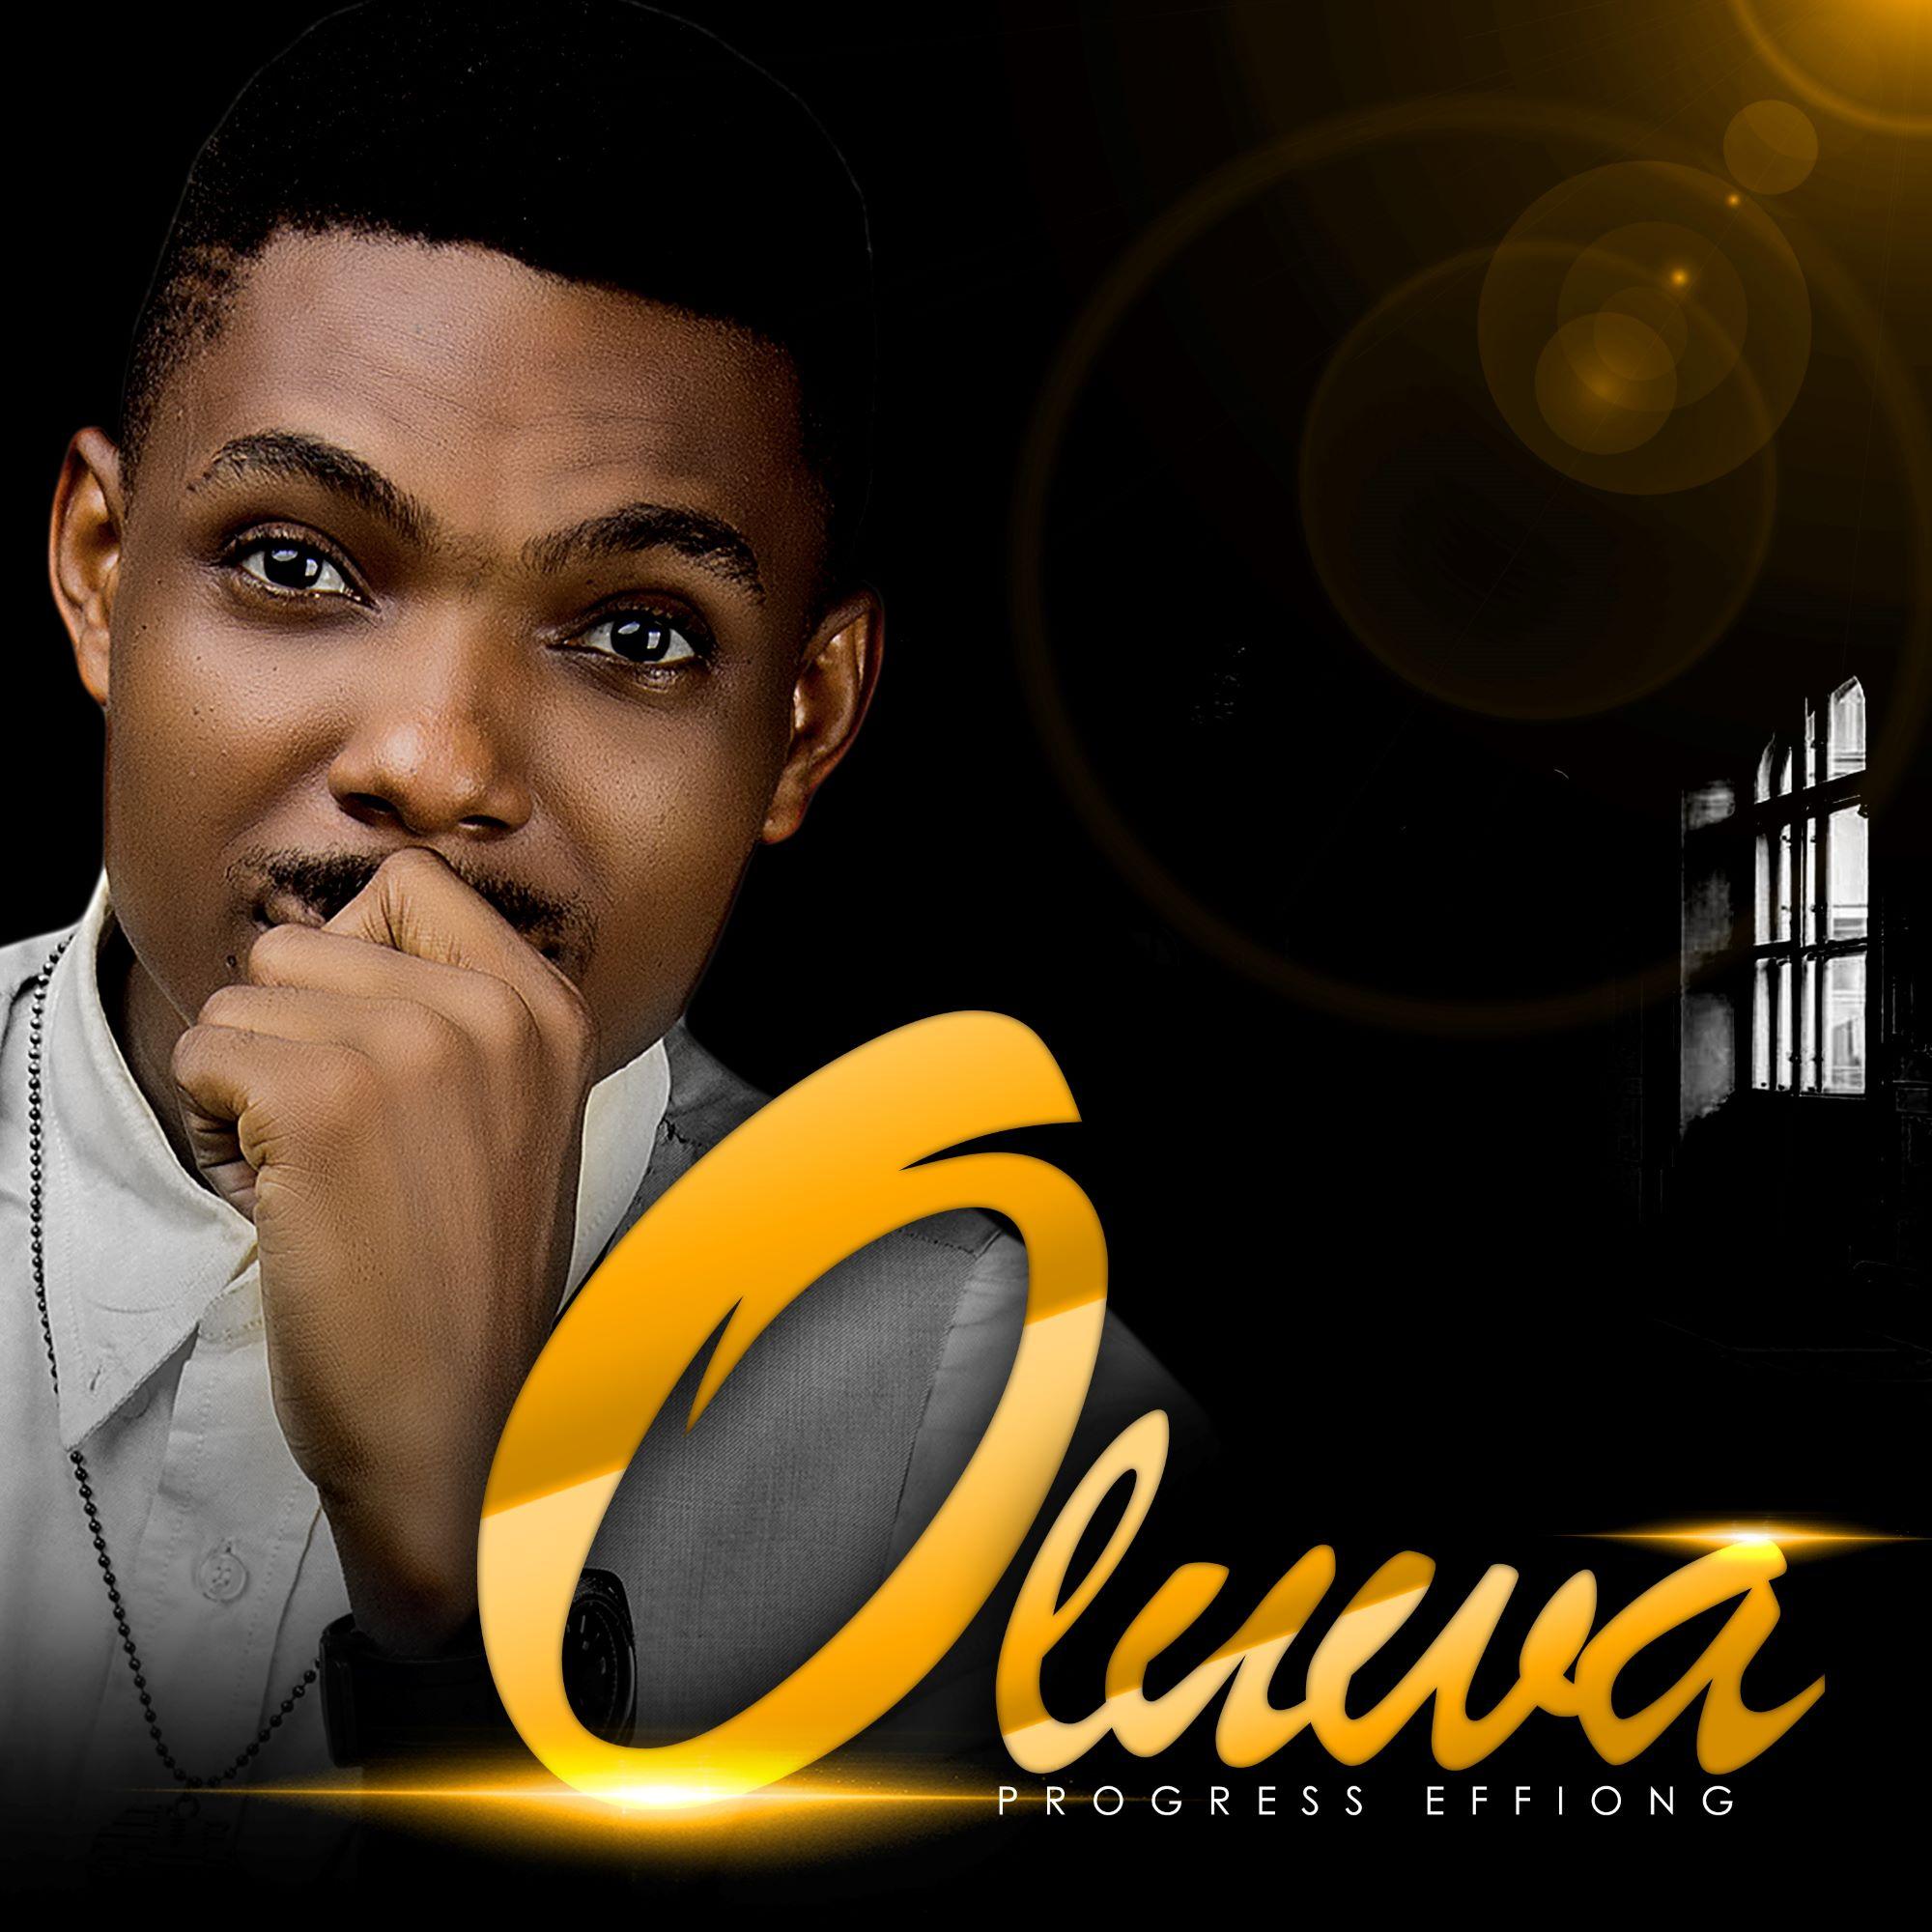 Progress Effiong - Oluwa Free Mp3 Download